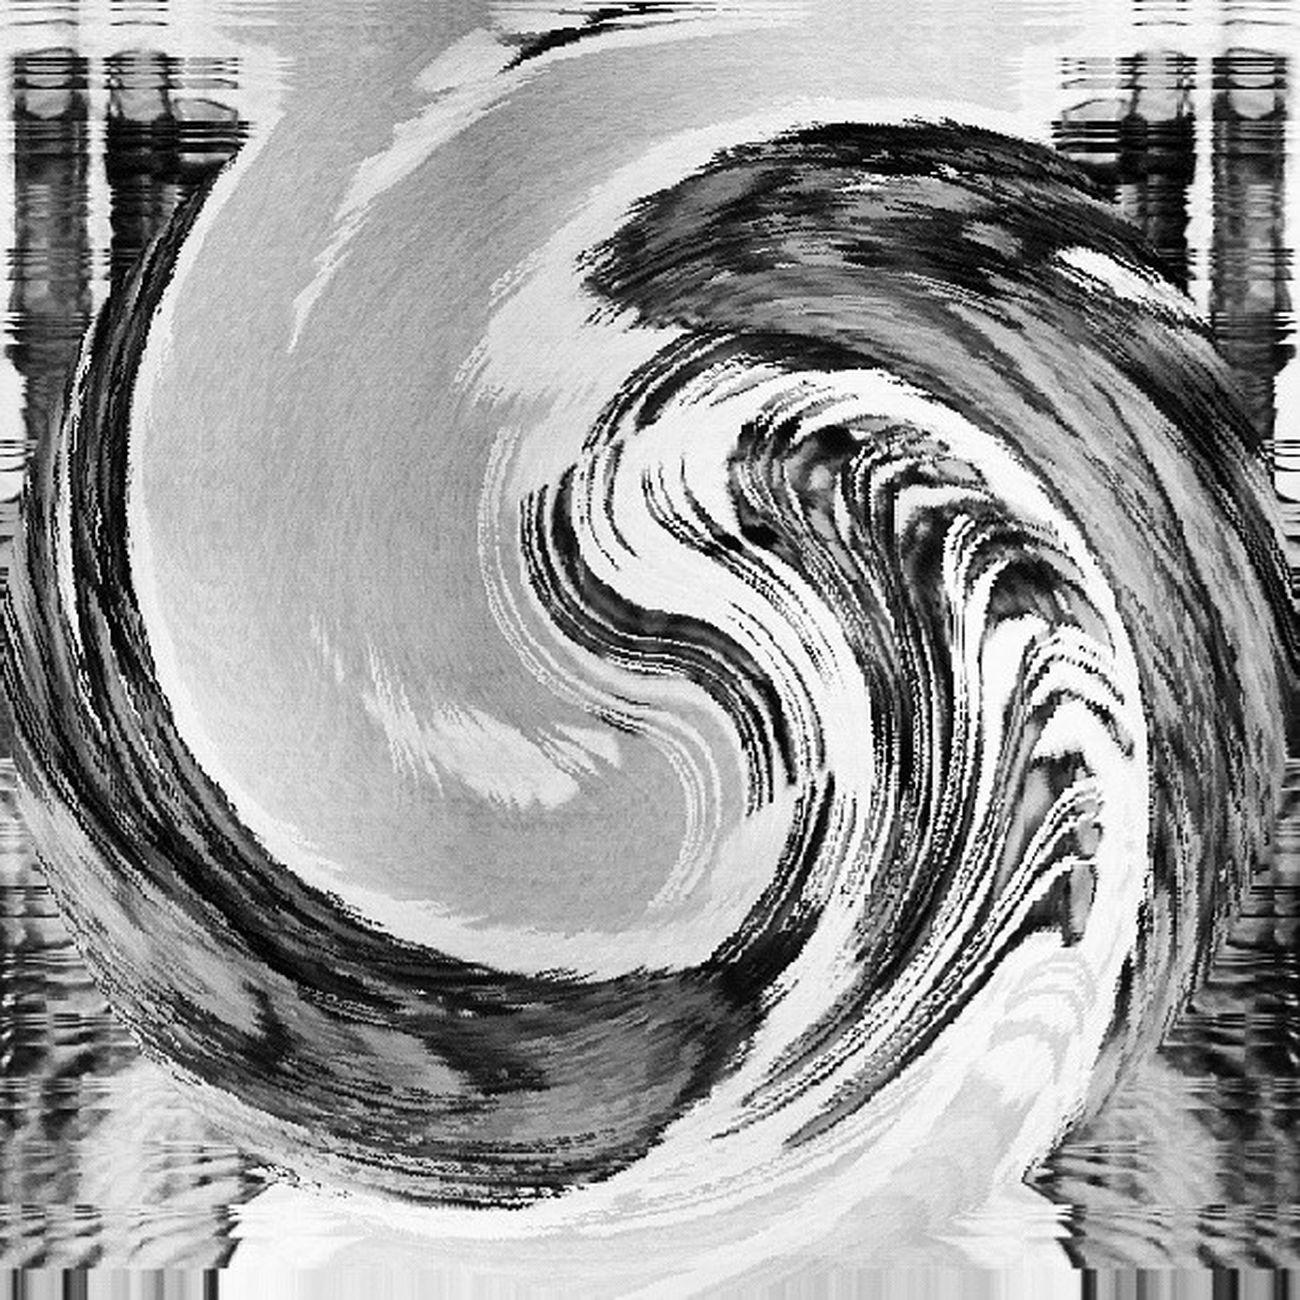 Swirl Swirls Swirly Swirling swirled swirlies swirlsandtwirls